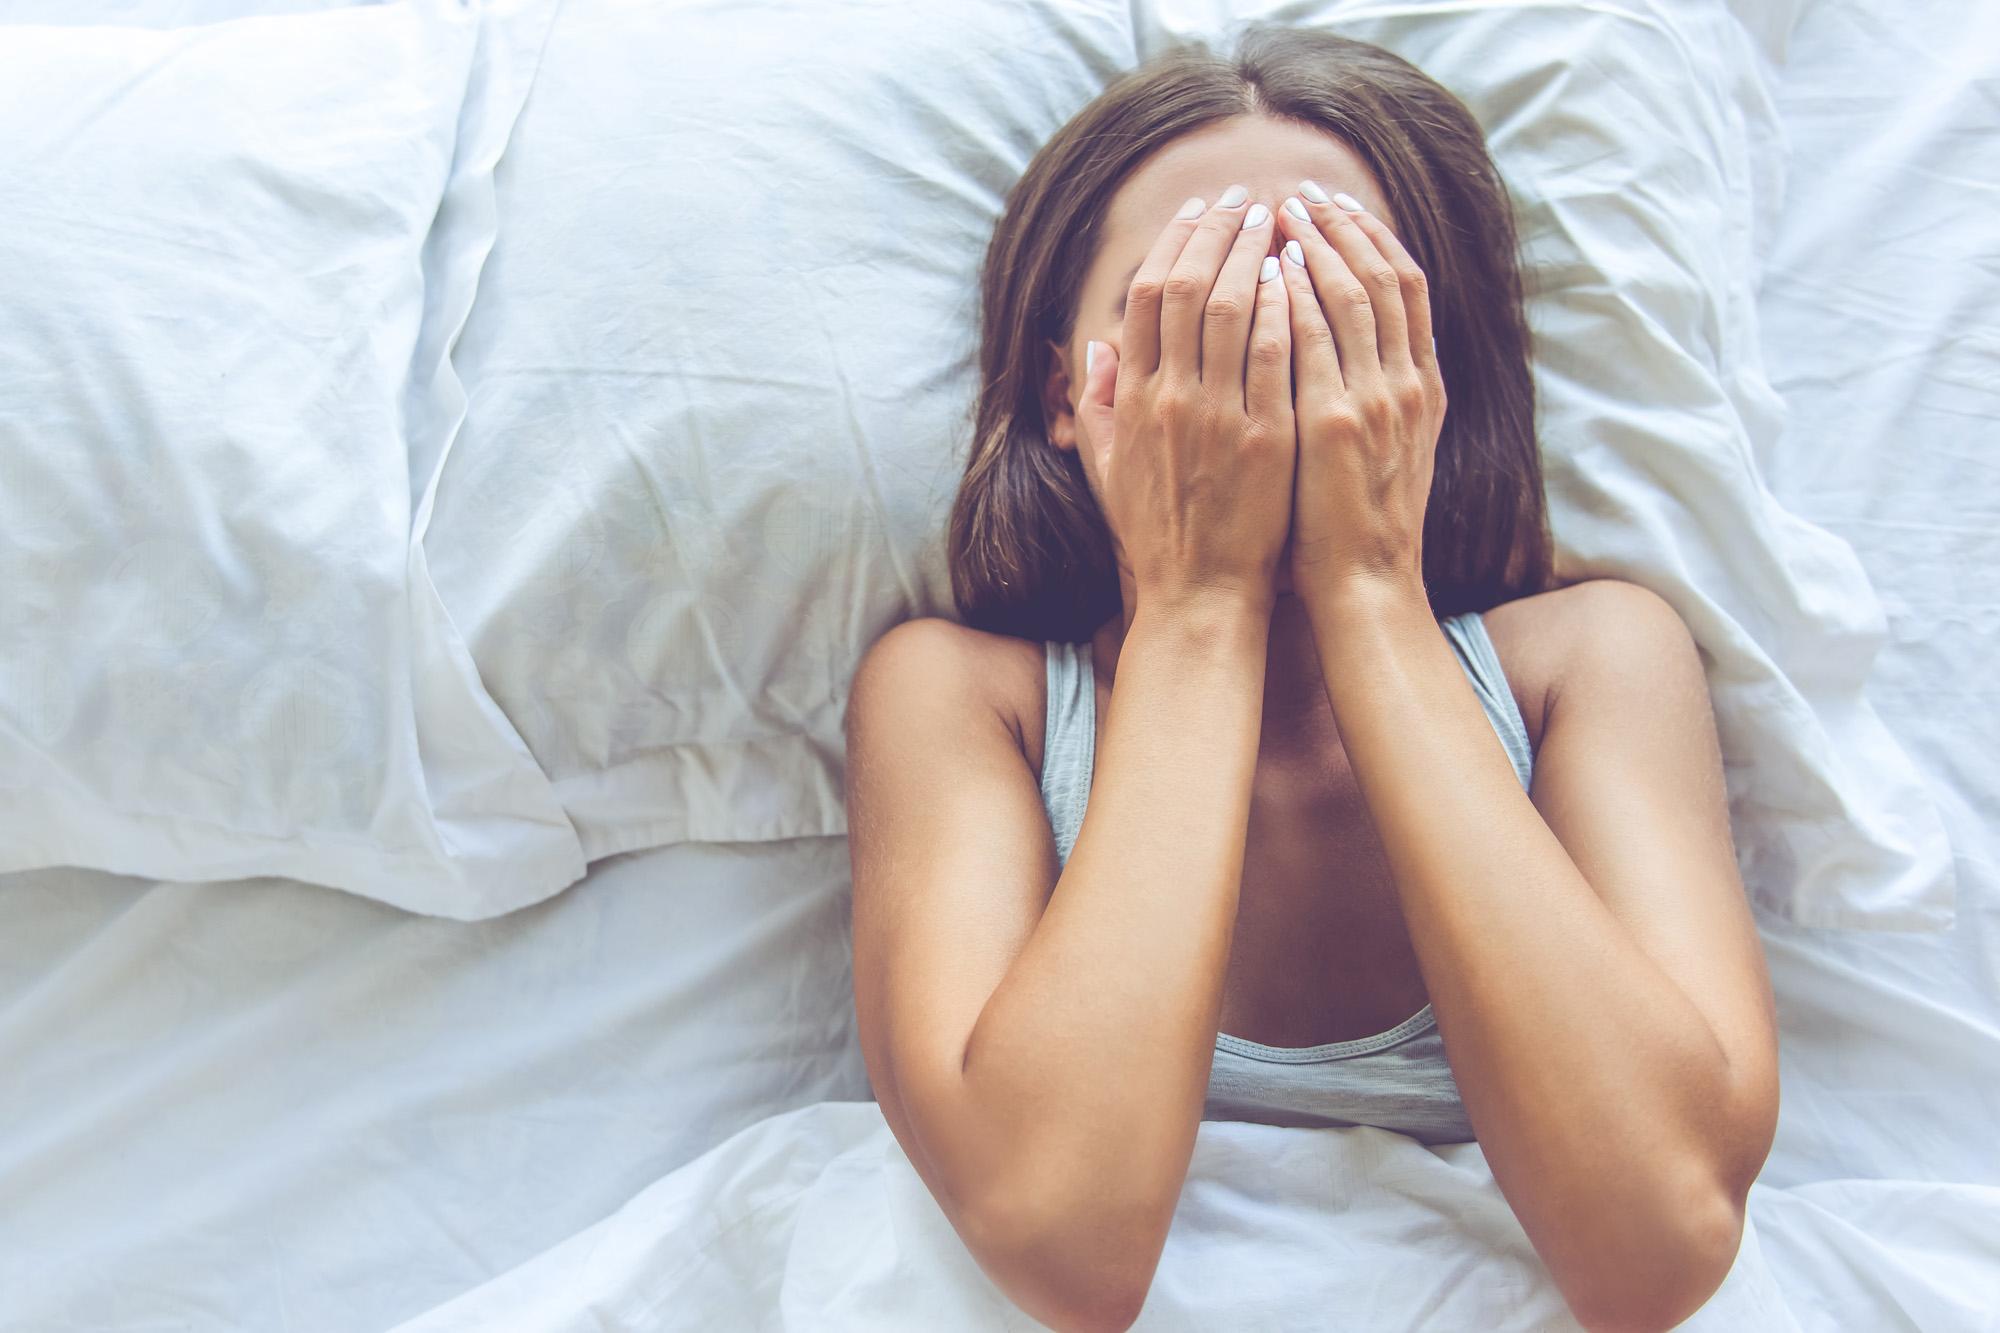 Erotic massage getting women risk during